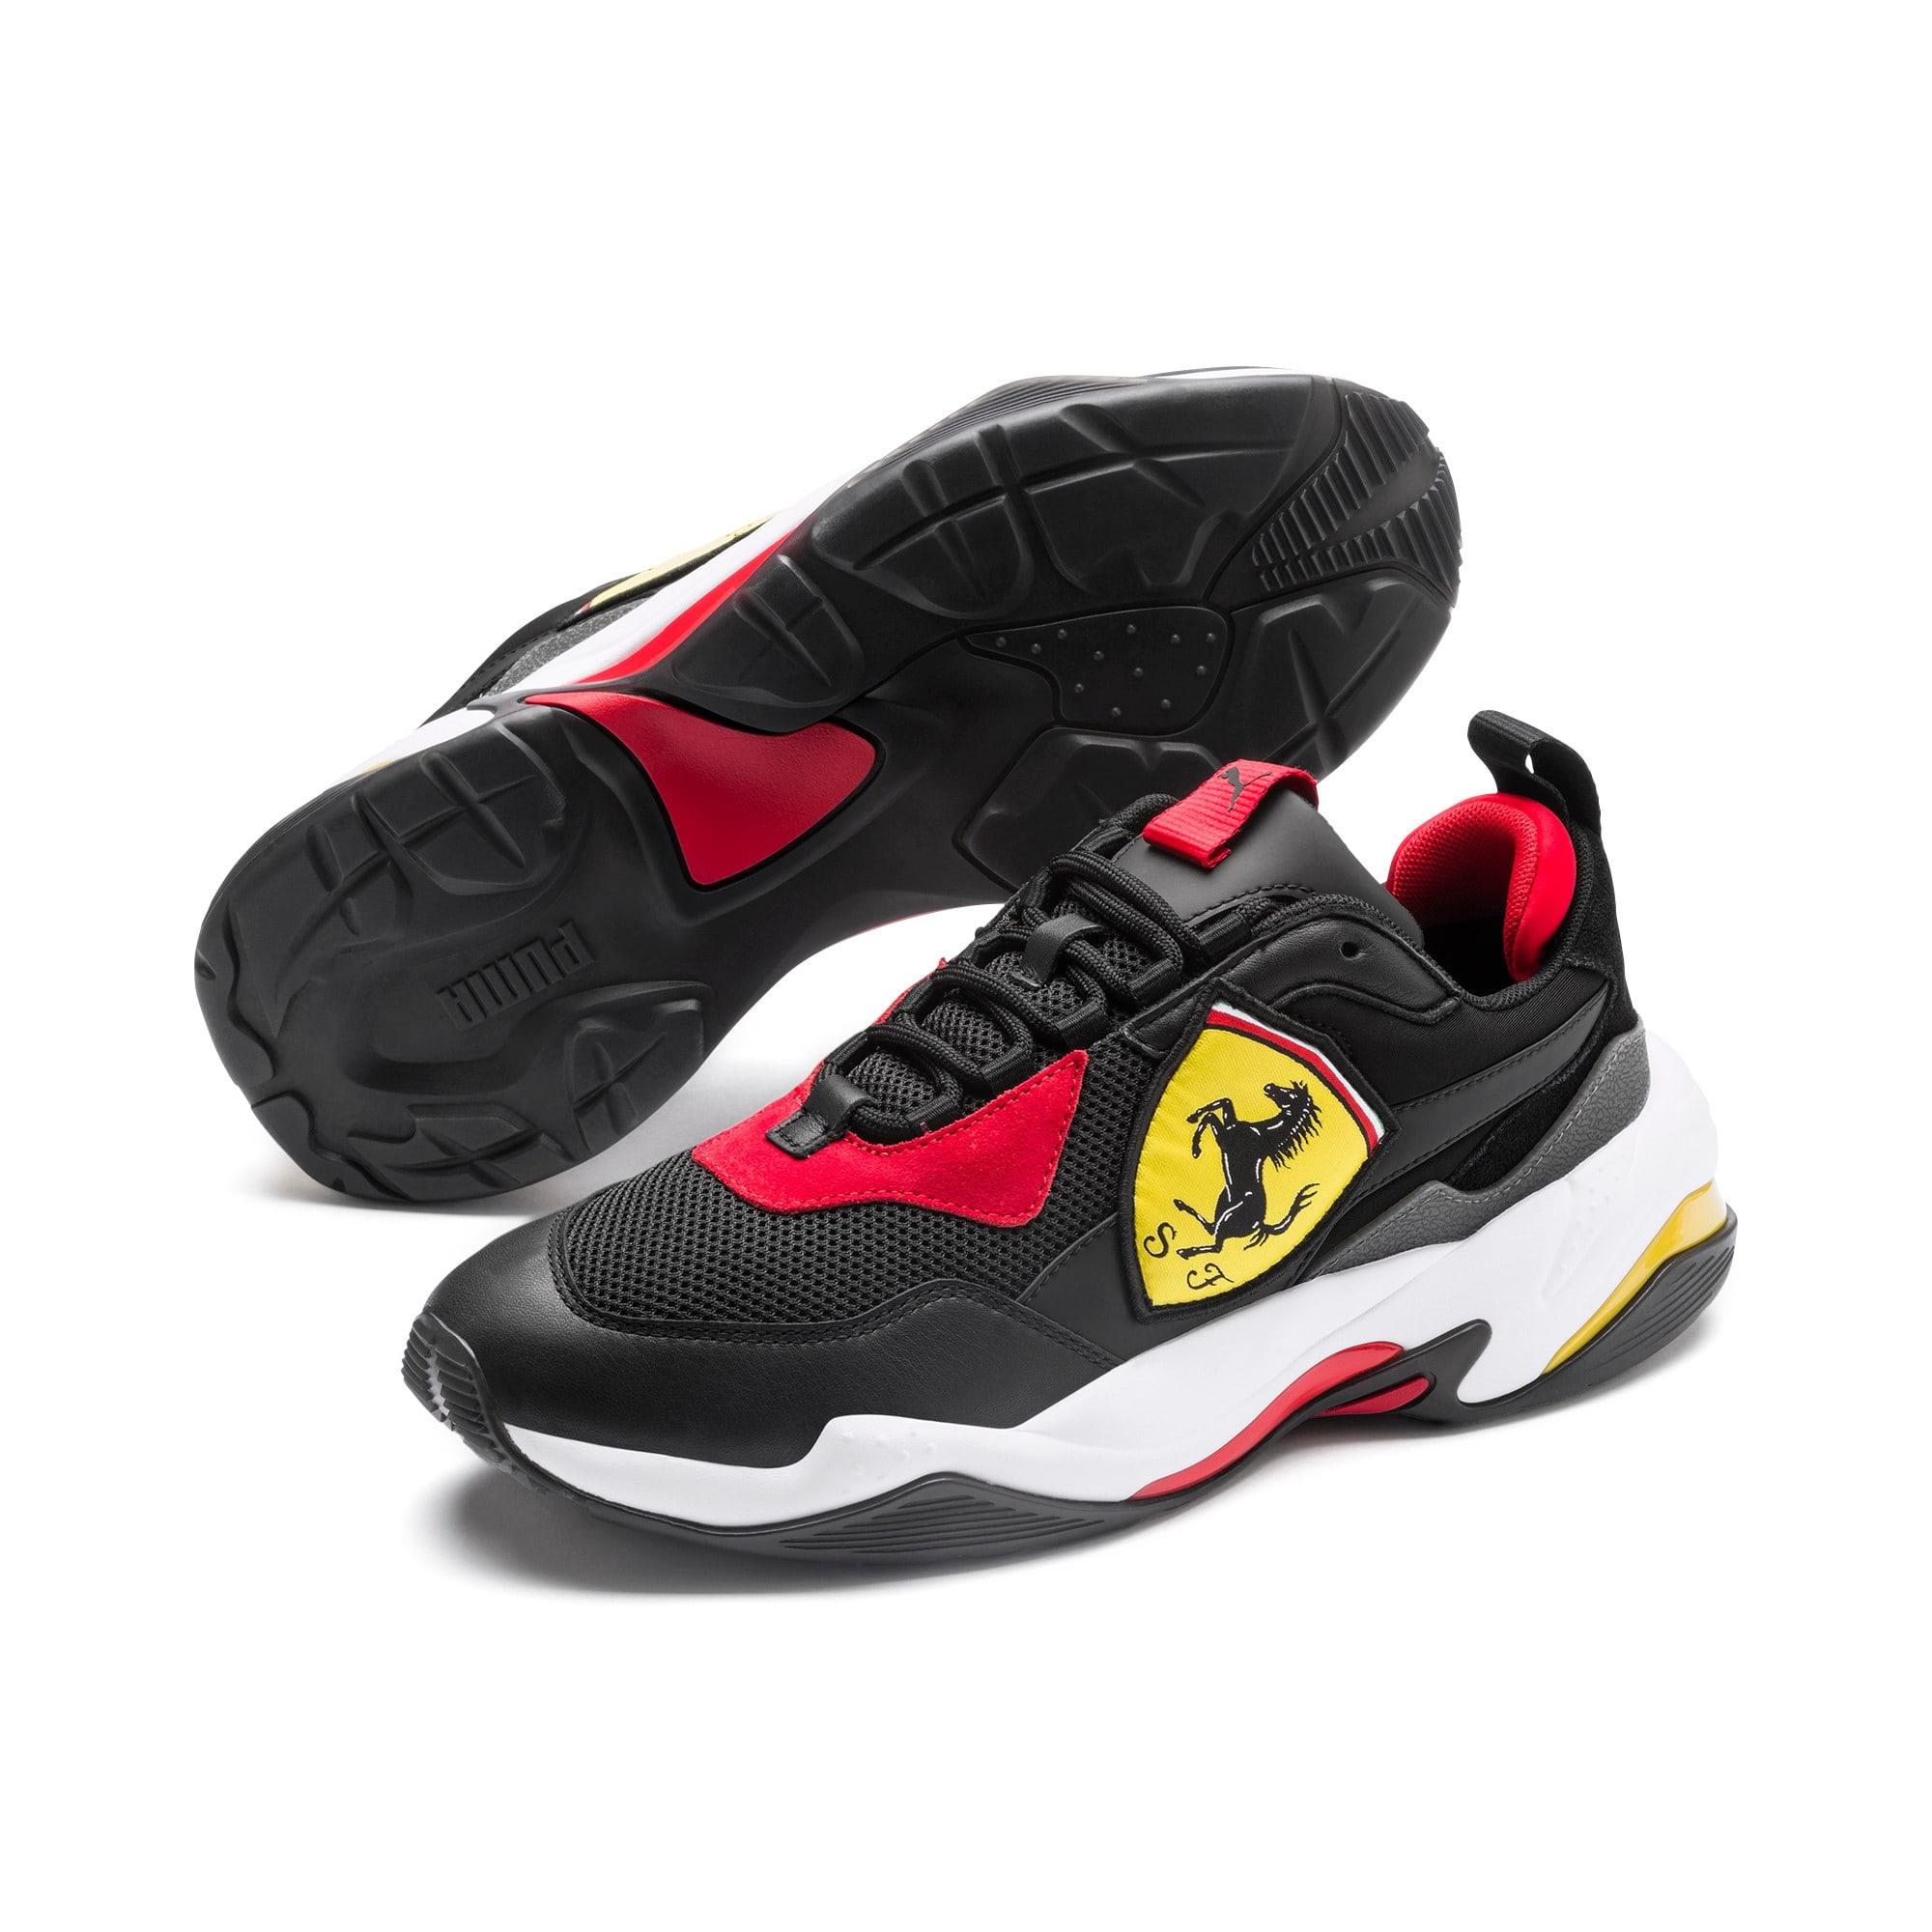 Thumbnail 2 of Ferrari Thunder Trainers, Puma Black-Rosso Corsa, medium